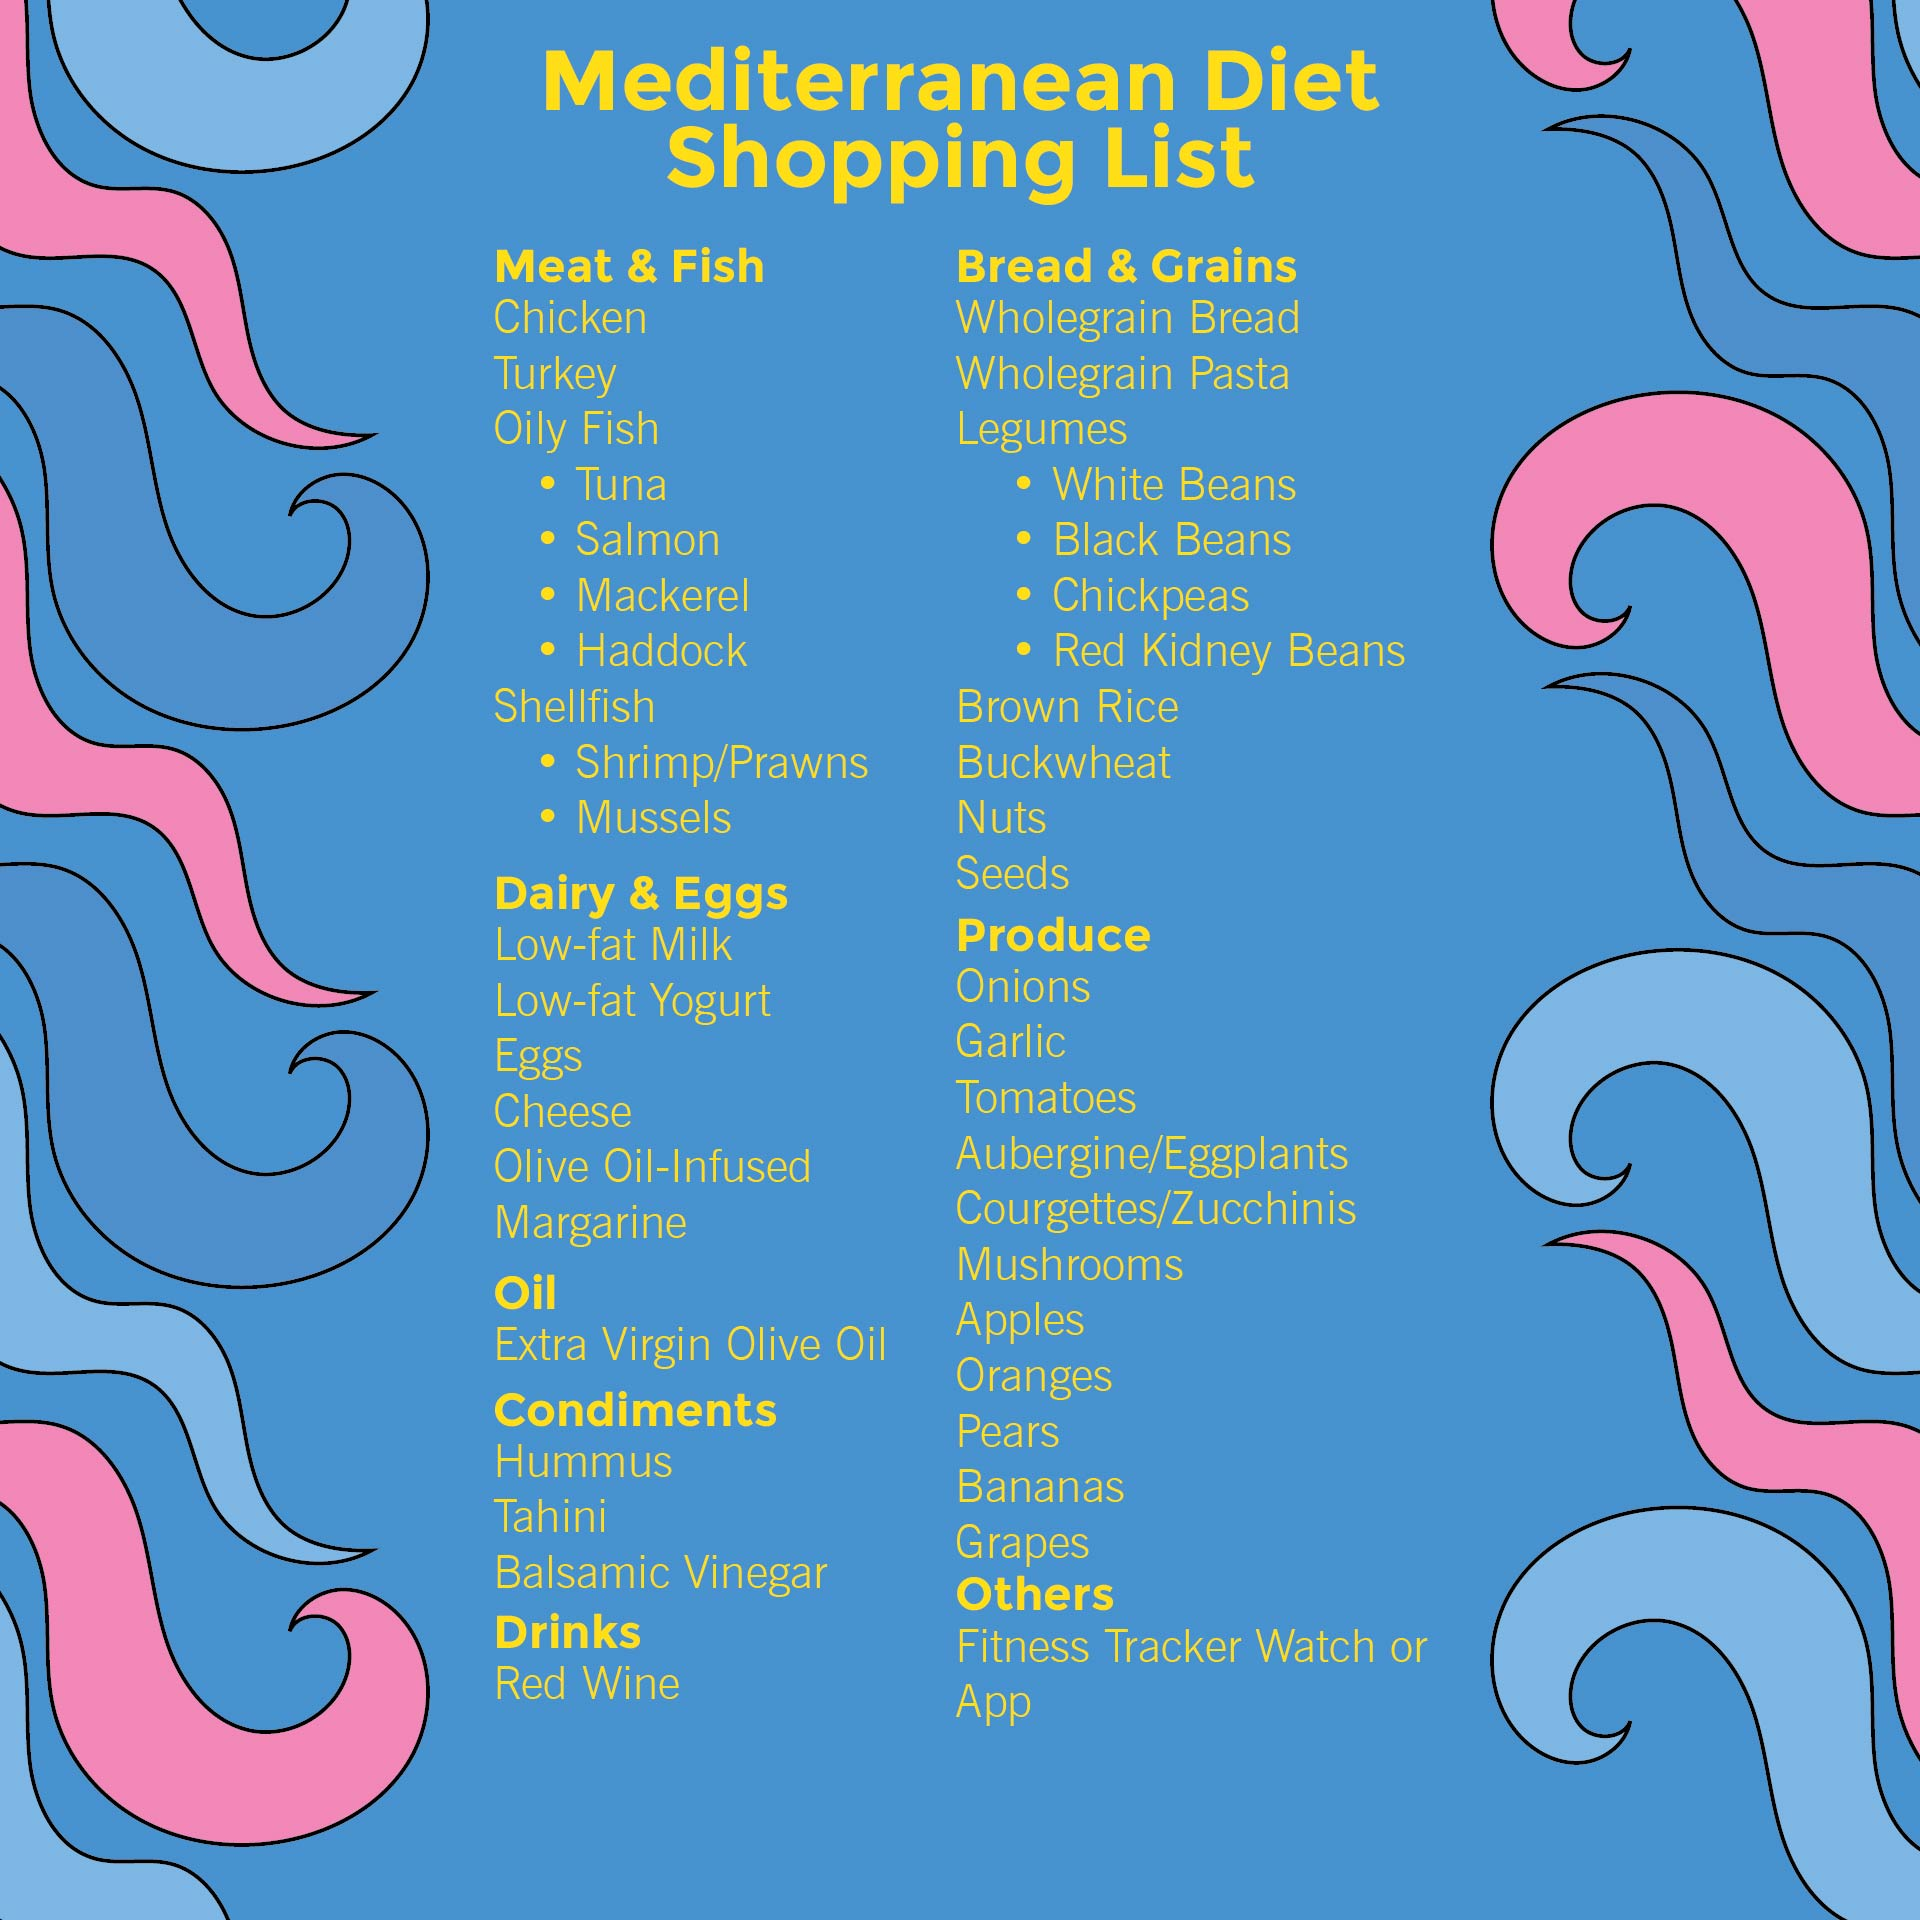 Mediterranean Diet Food List Grocery